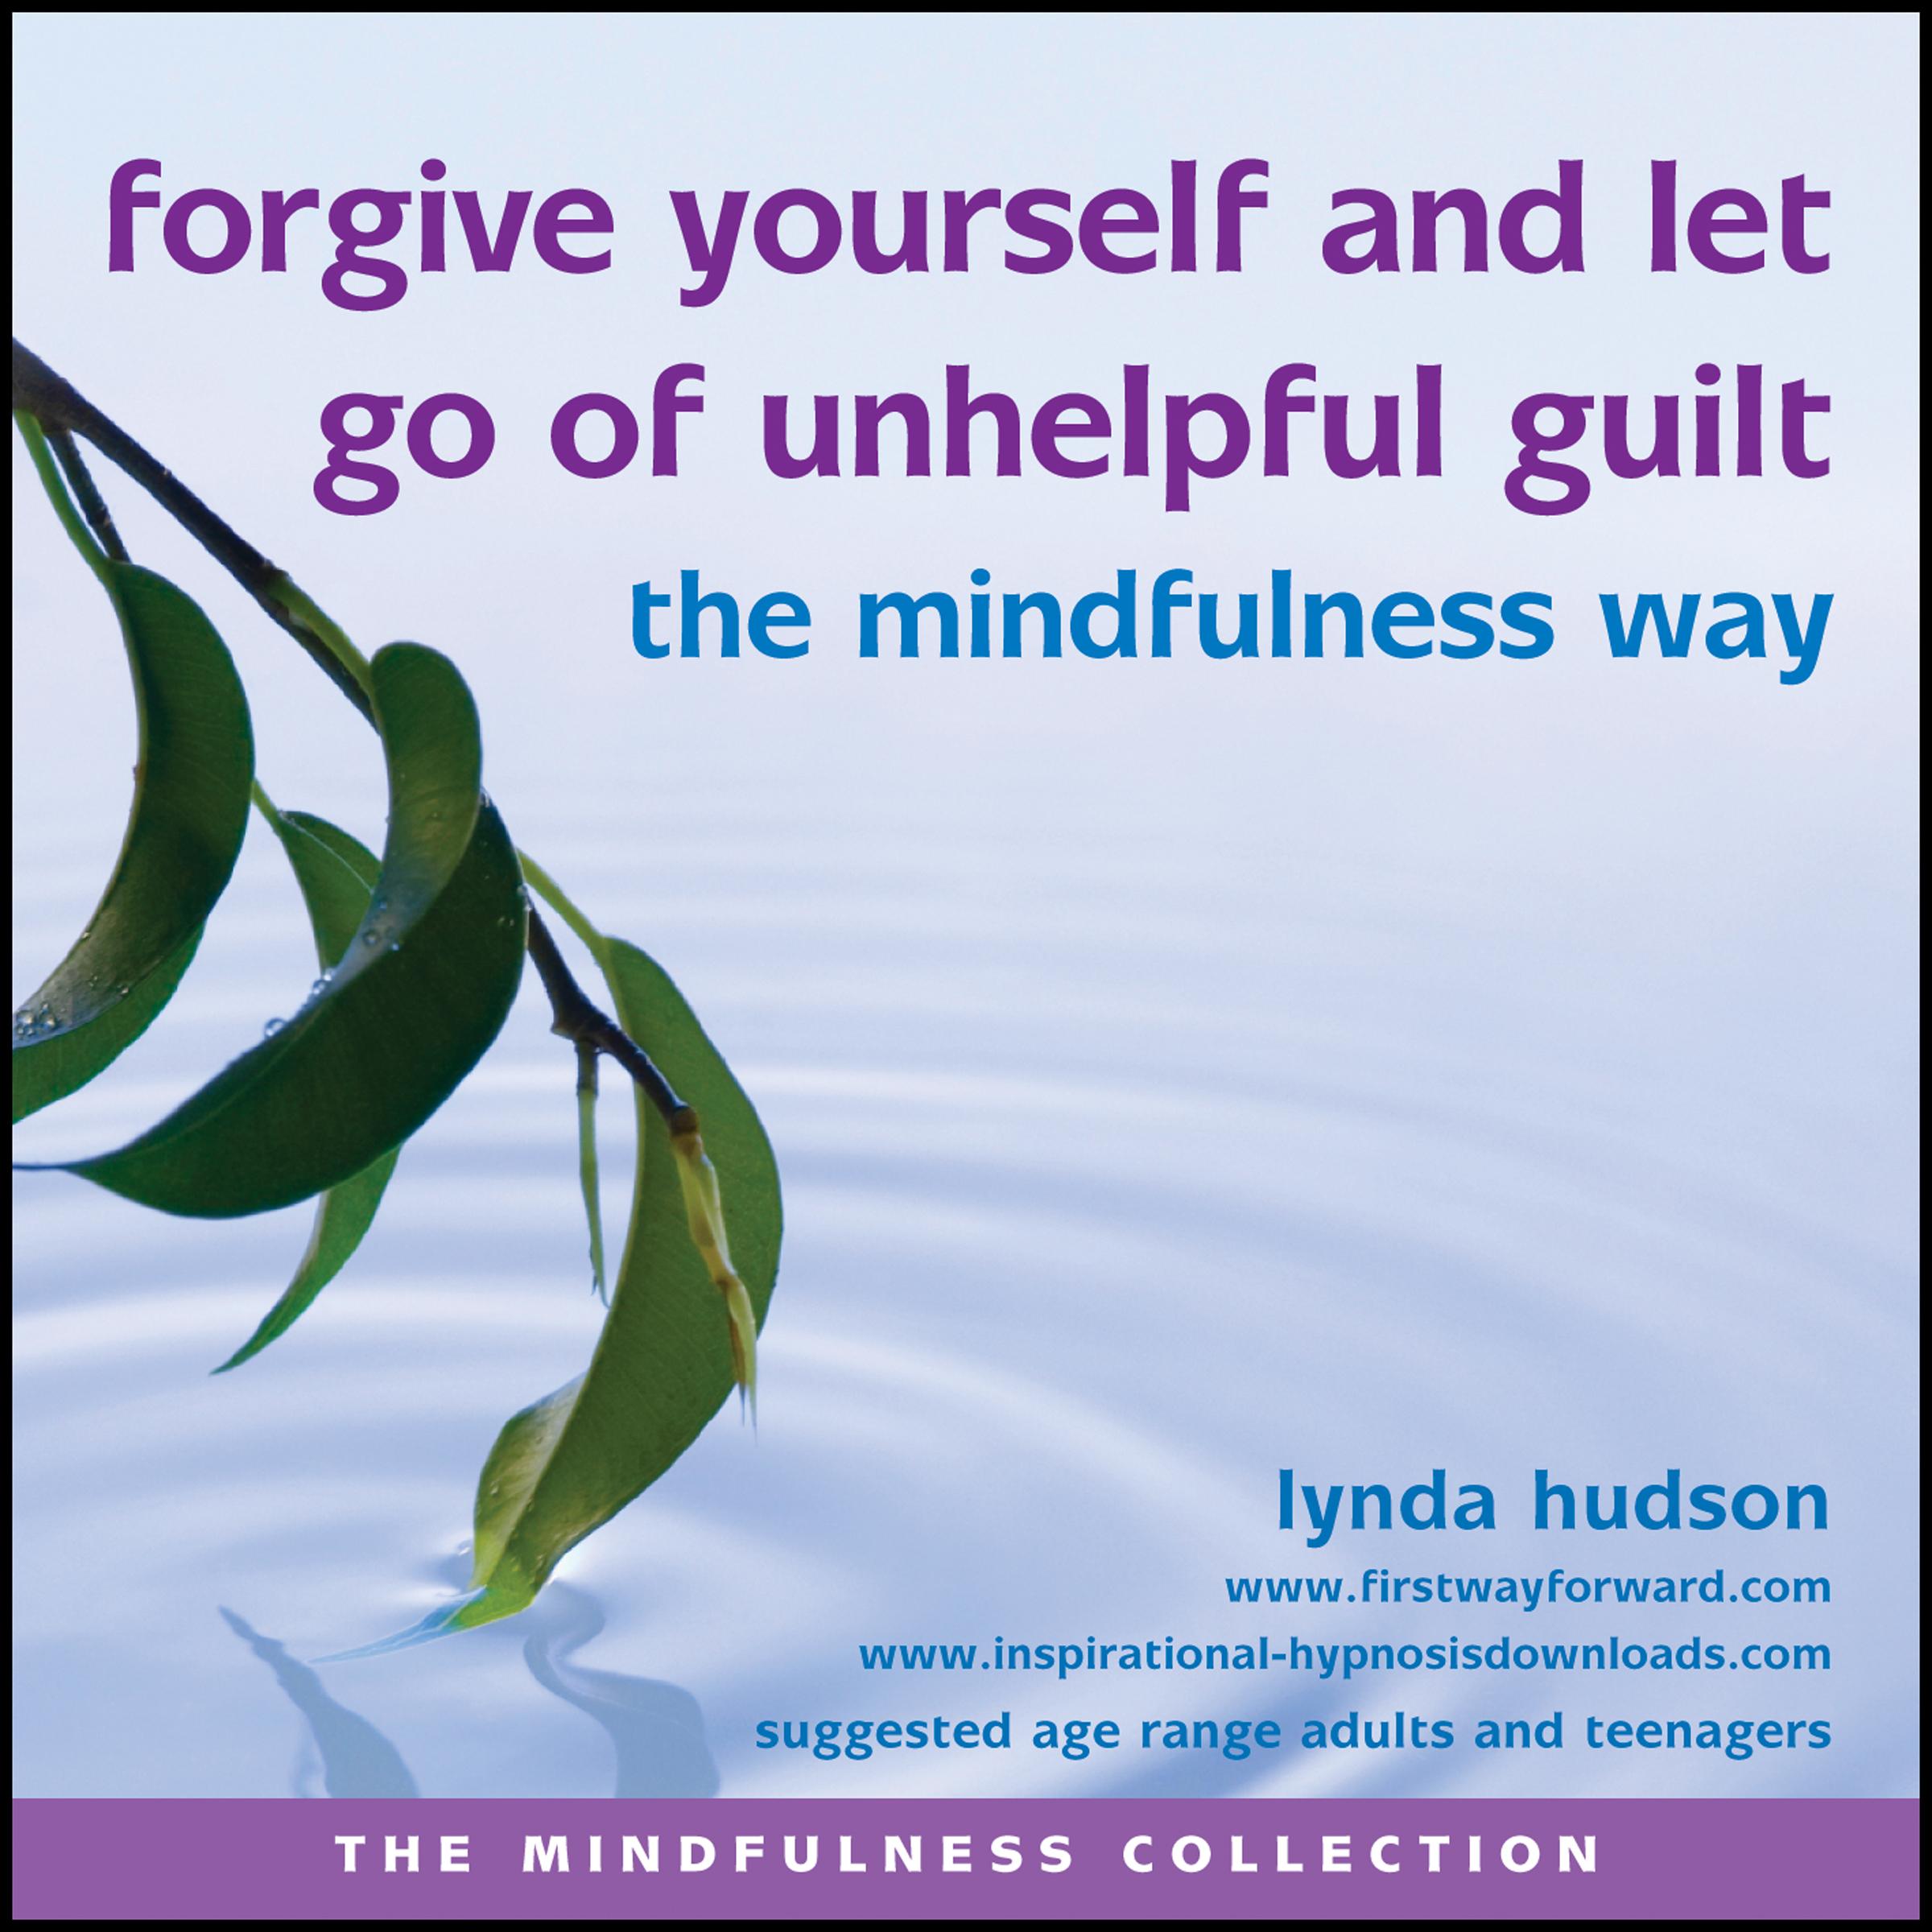 Forgive yourself the mindfulness way